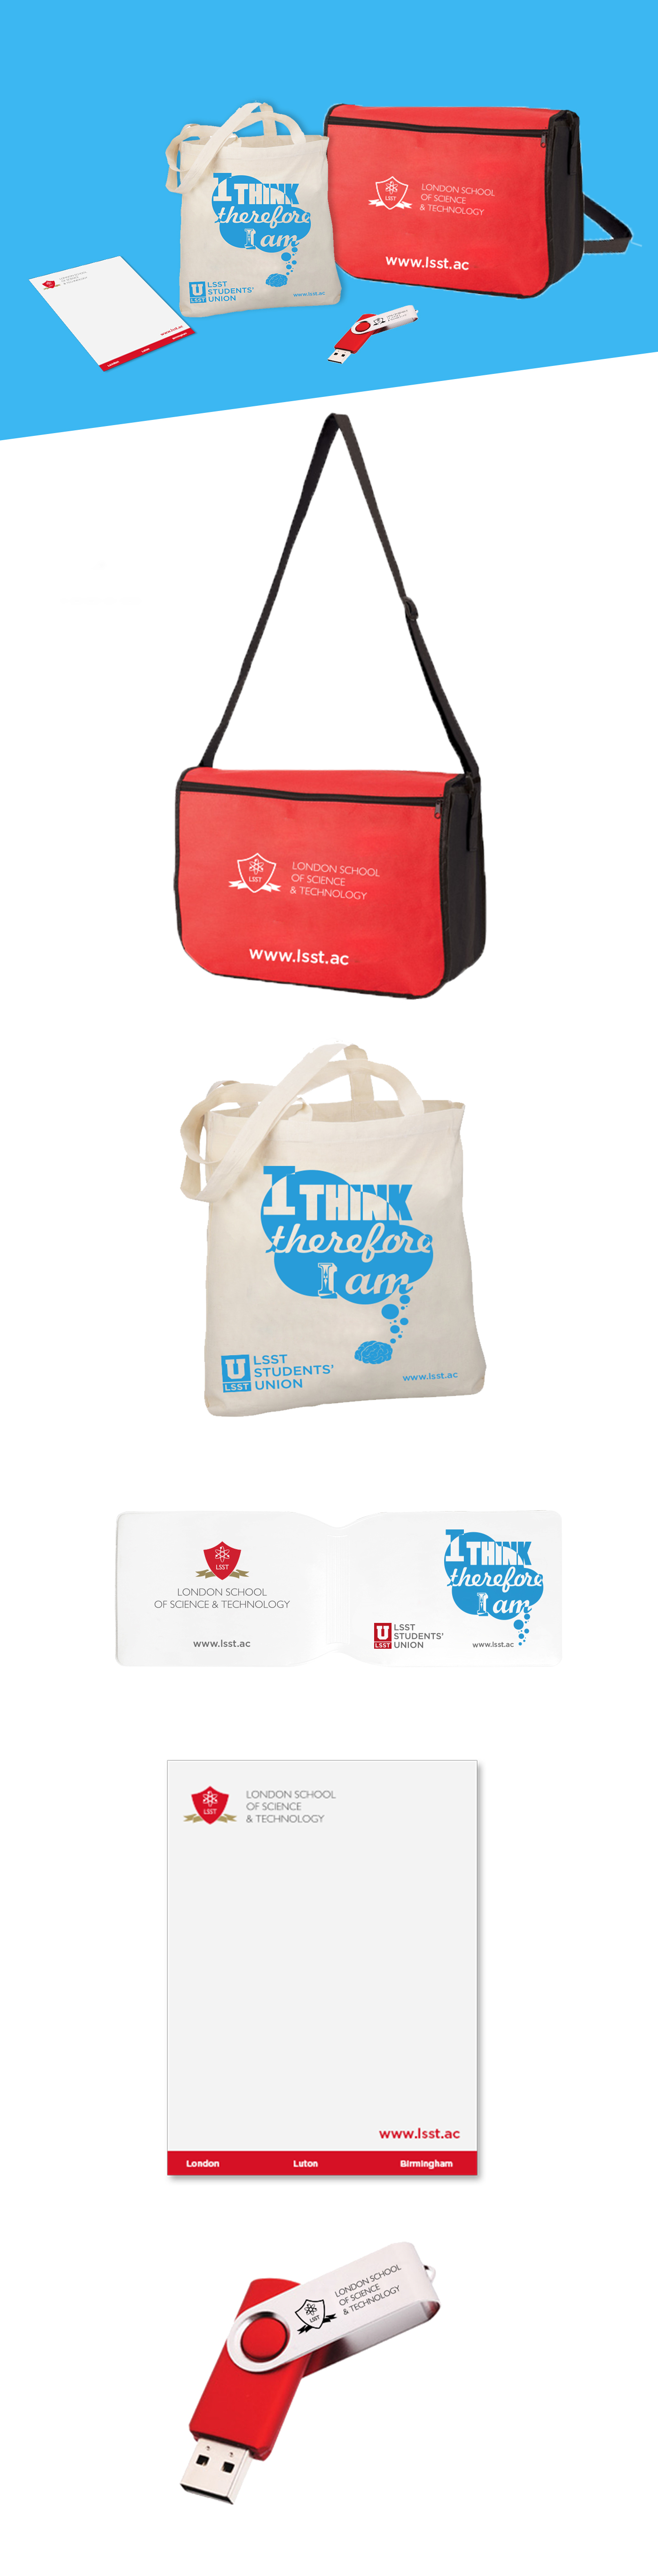 promotional items marketing